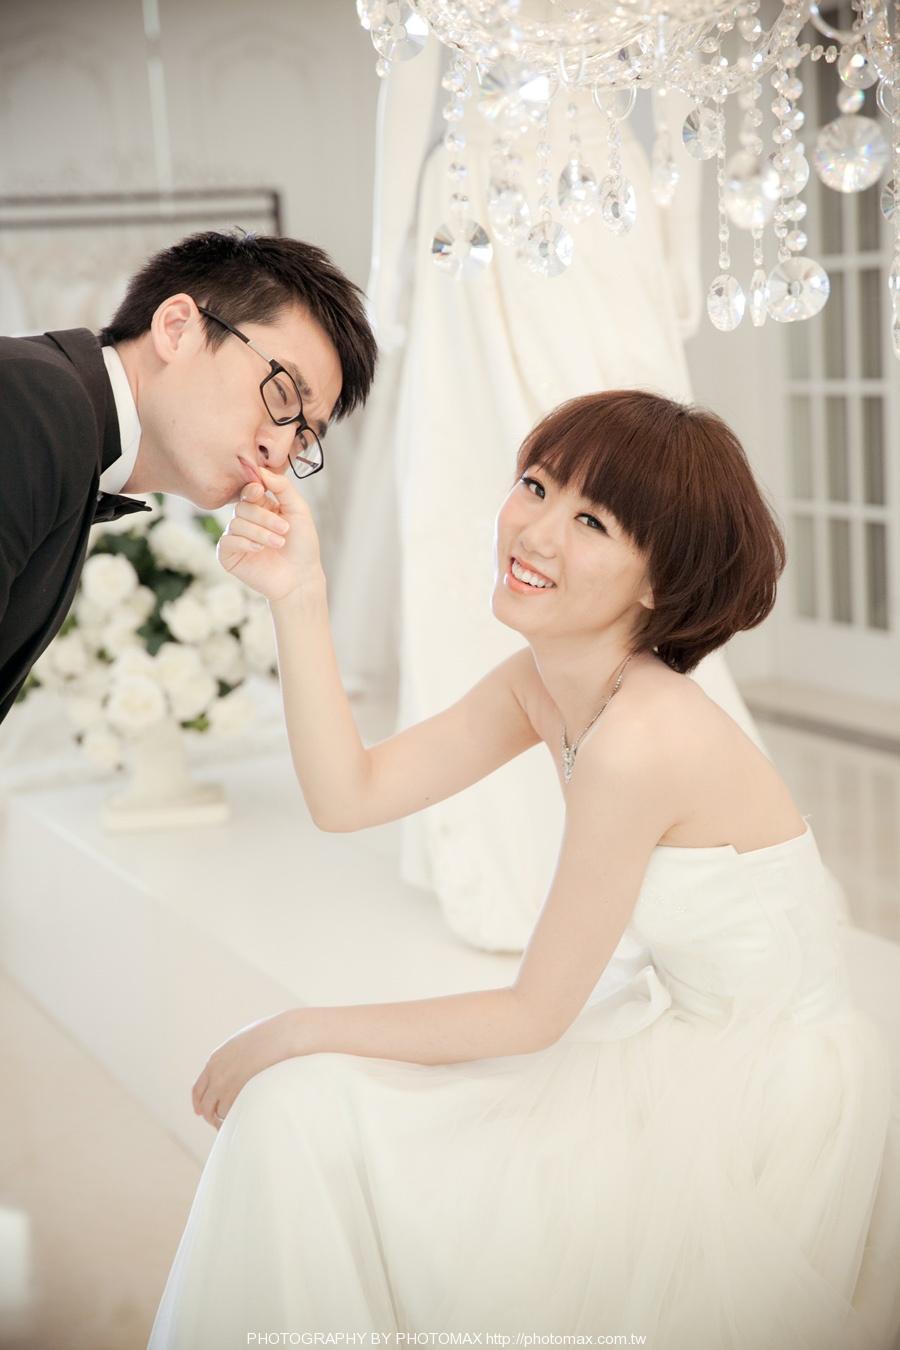 赵璞然 PHOTOMAX 婚纱摄影 PHOTO MAX 老麦摄影 (2)